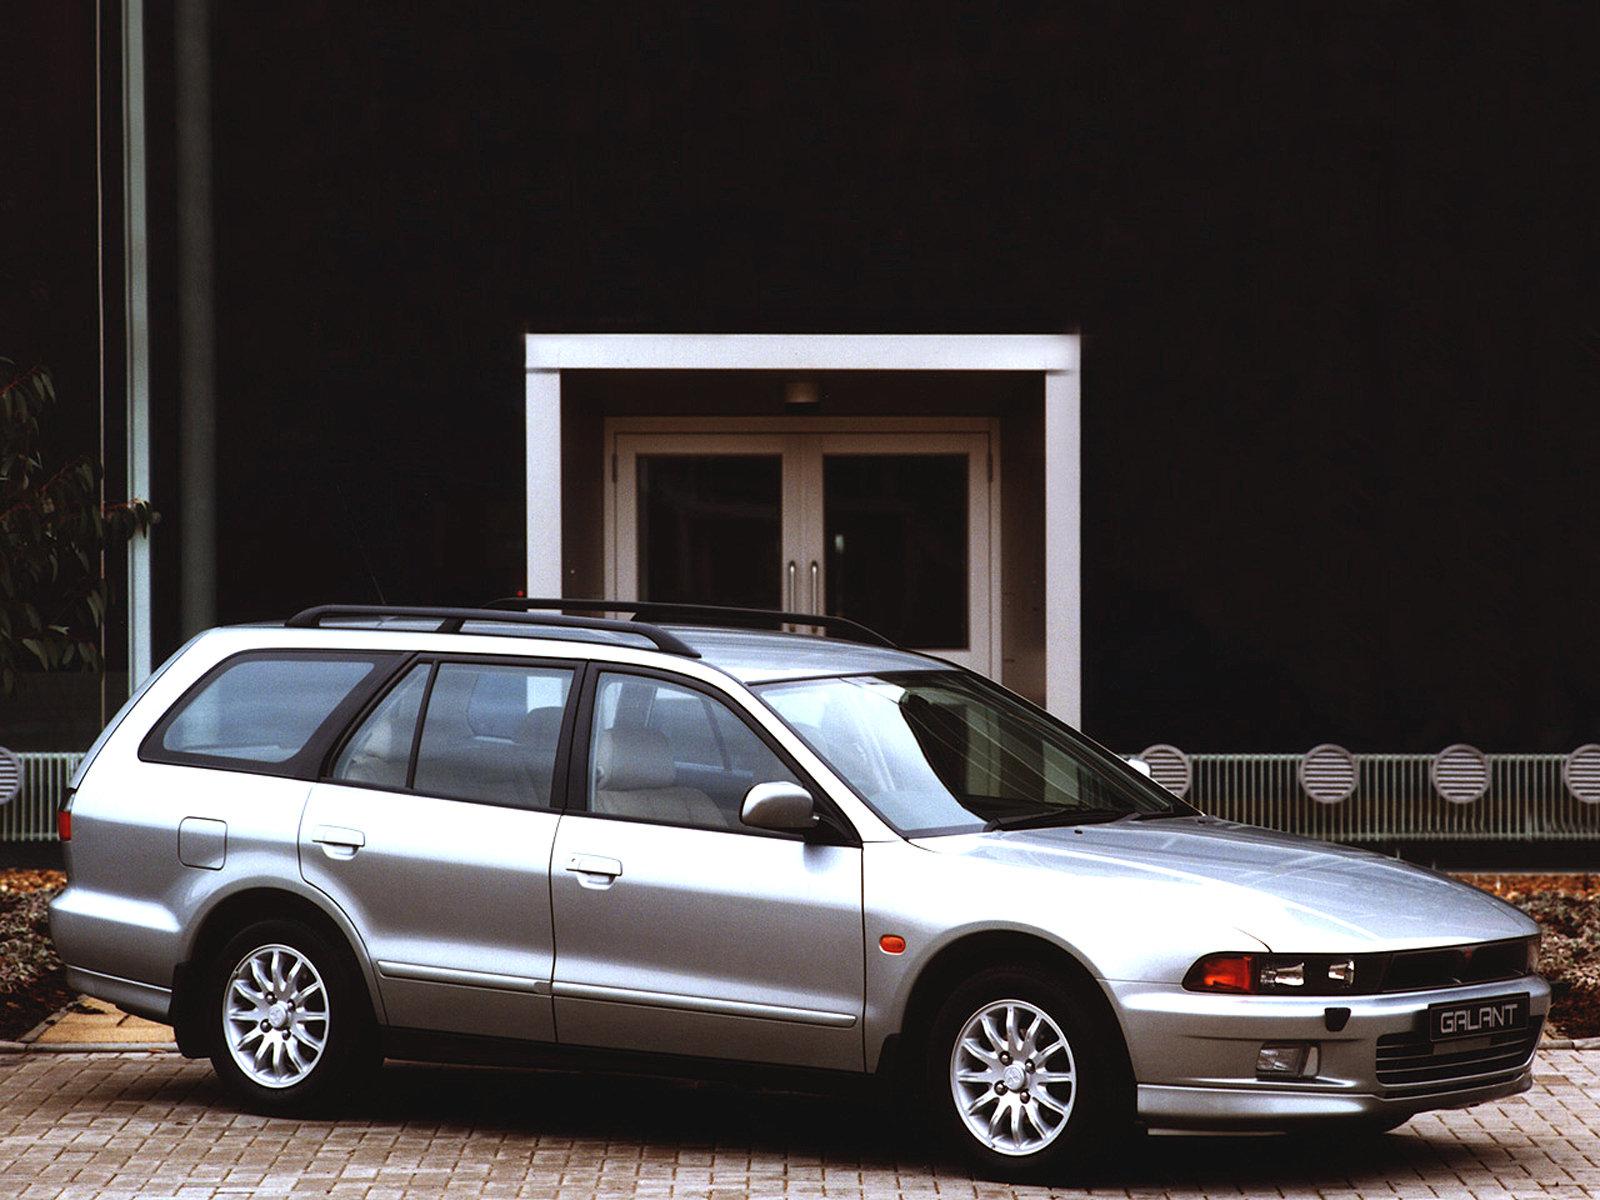 Mitsubishi (Мицубиси) Galant Station Wagon 1997-2001 г.